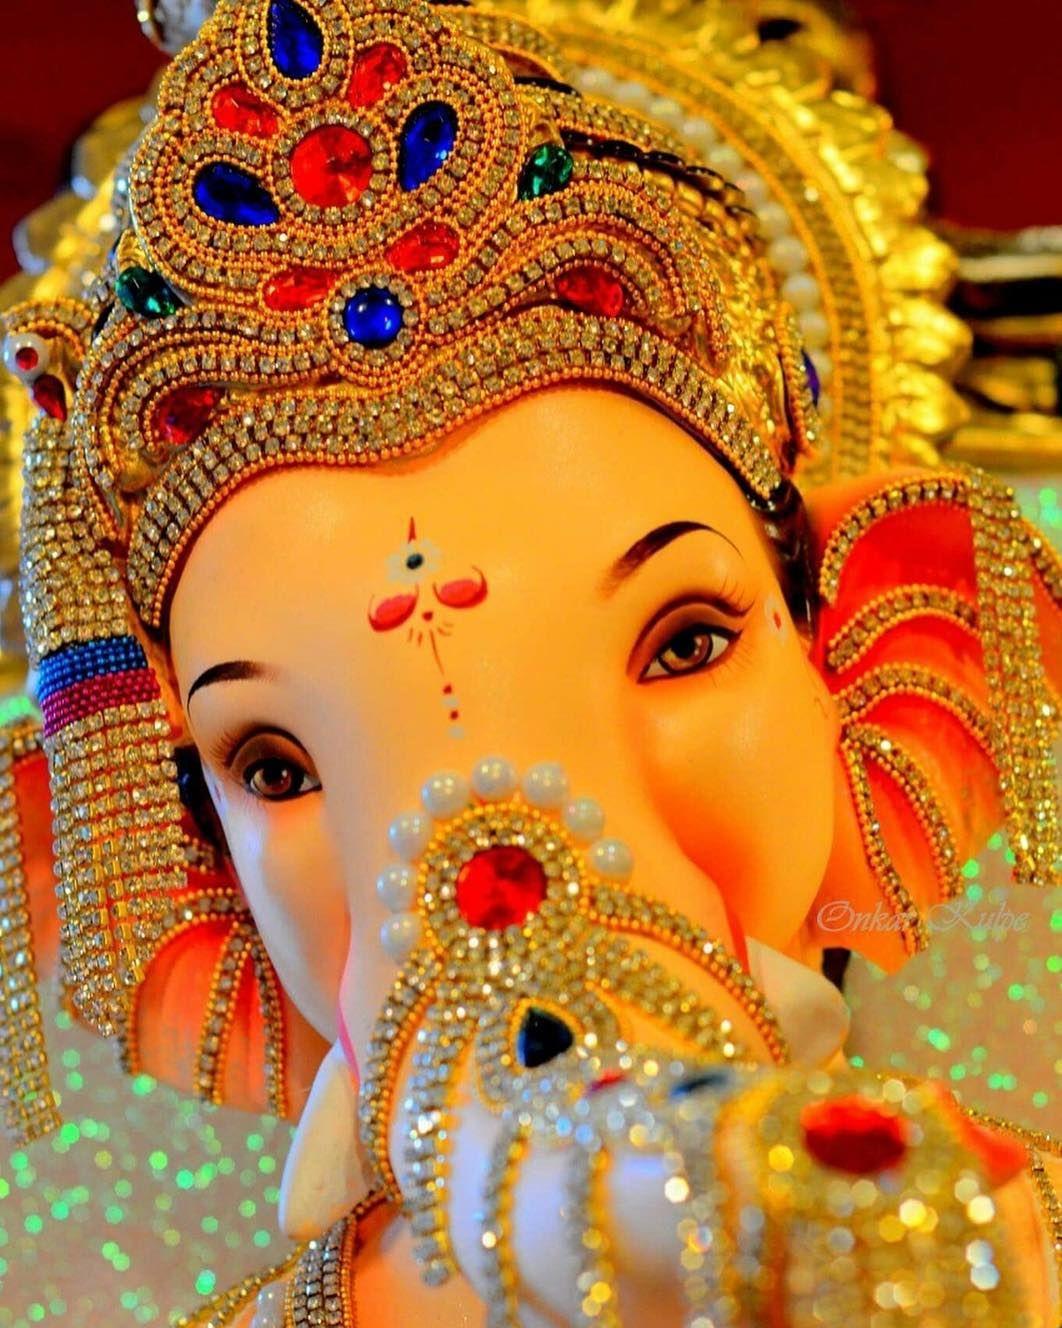 Ganesh Ji Image Ganpati Images Hd Download 1062x1328 Download Hd Wallpaper Wallpapertip